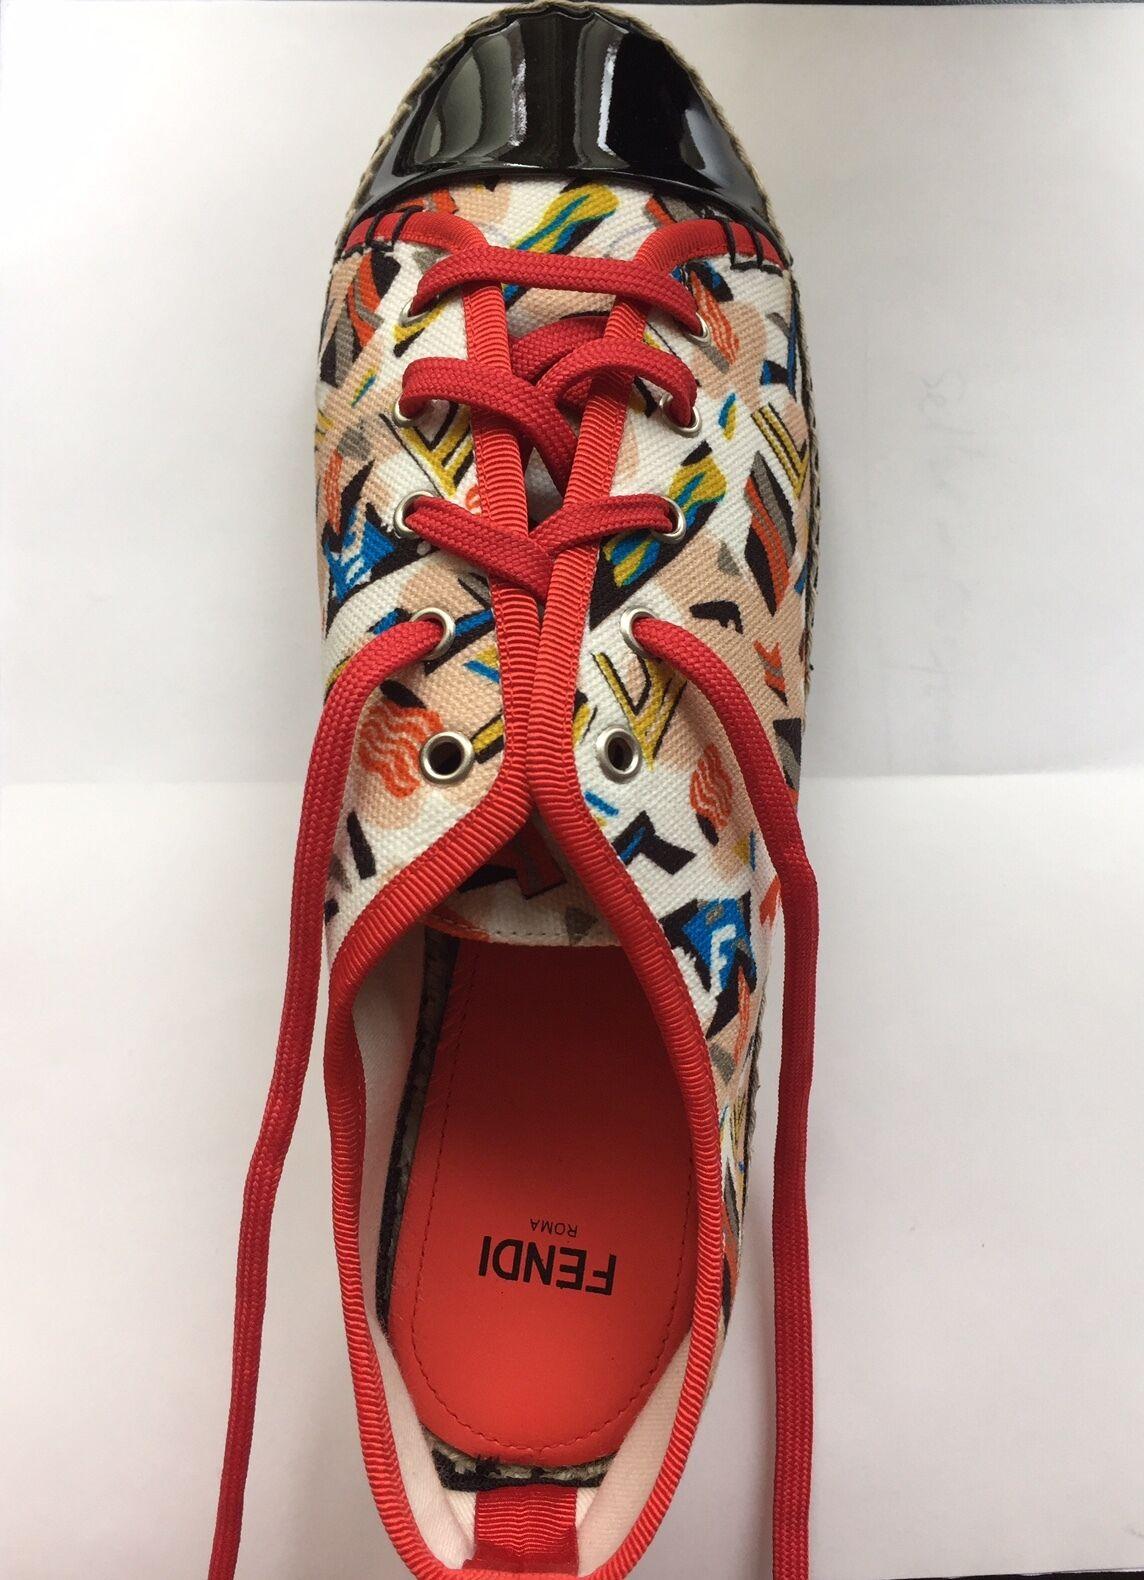 450 NEW Fendi Junia Canvas Patent Leather Espadrille Sneakers Size 36.5 6.5